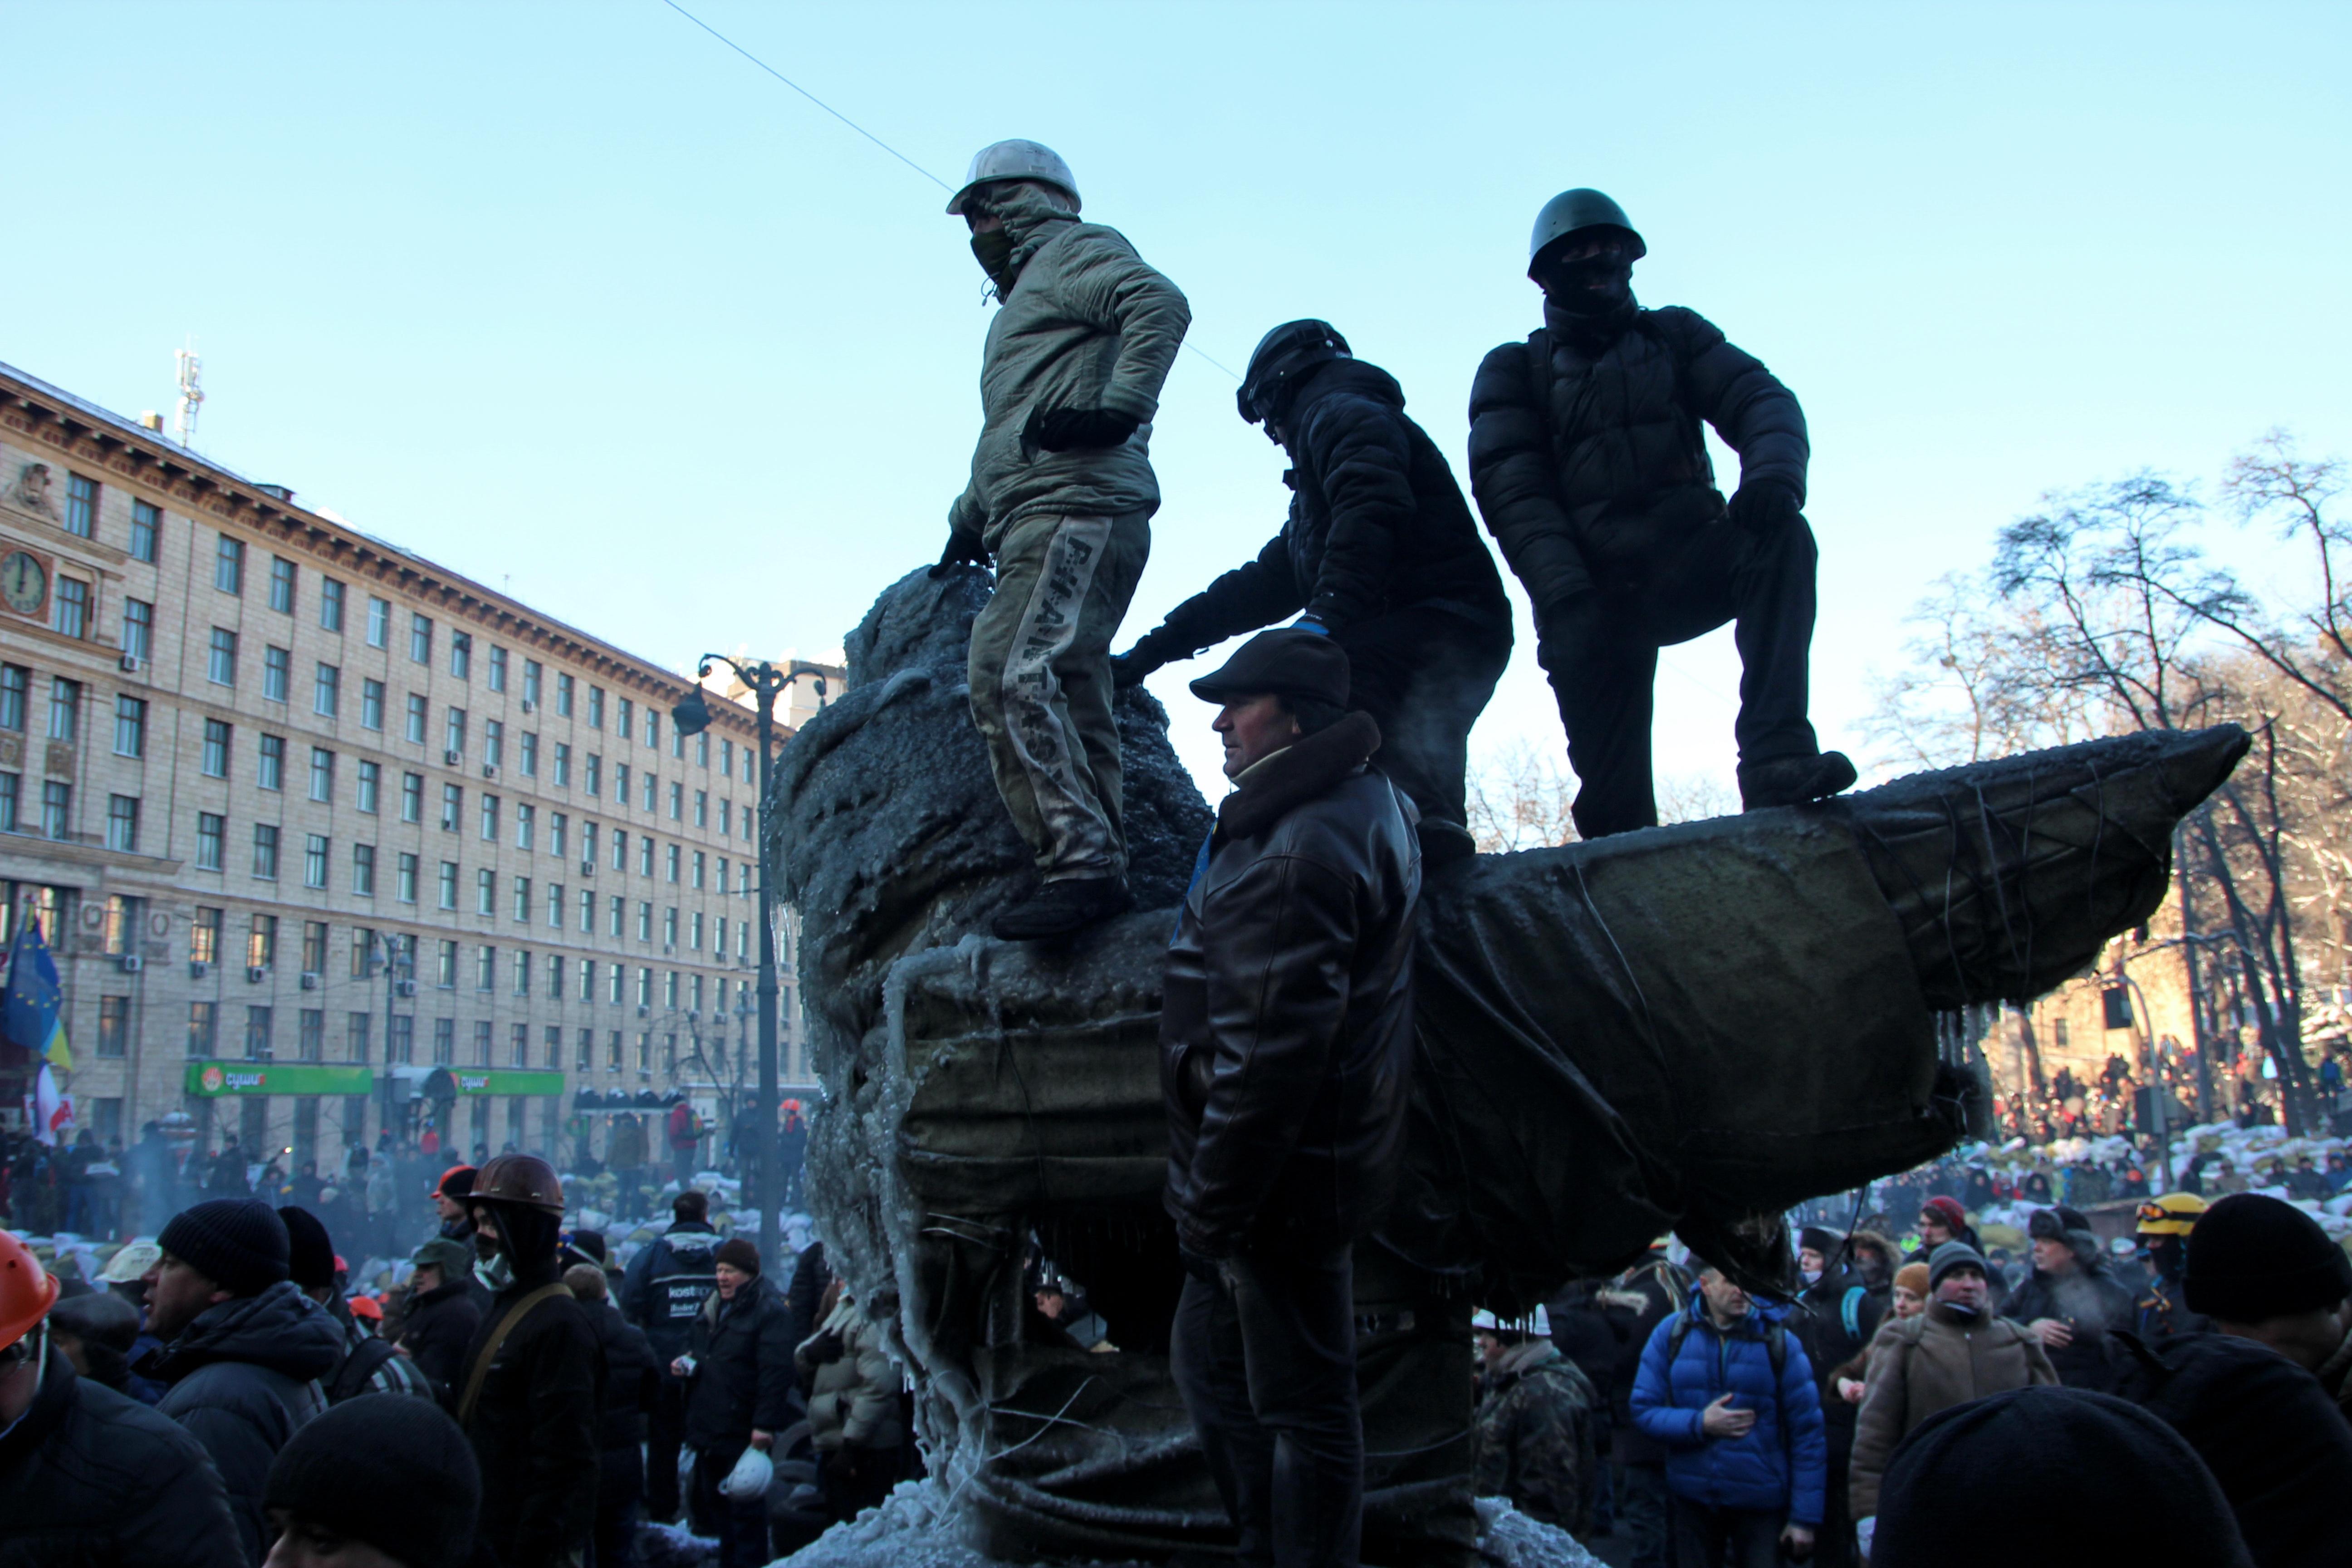 Украина, Киев. Противостояние активистов оппозиции и спецназа на улице Грушевского. Защитники евромайдана на баррикадах.